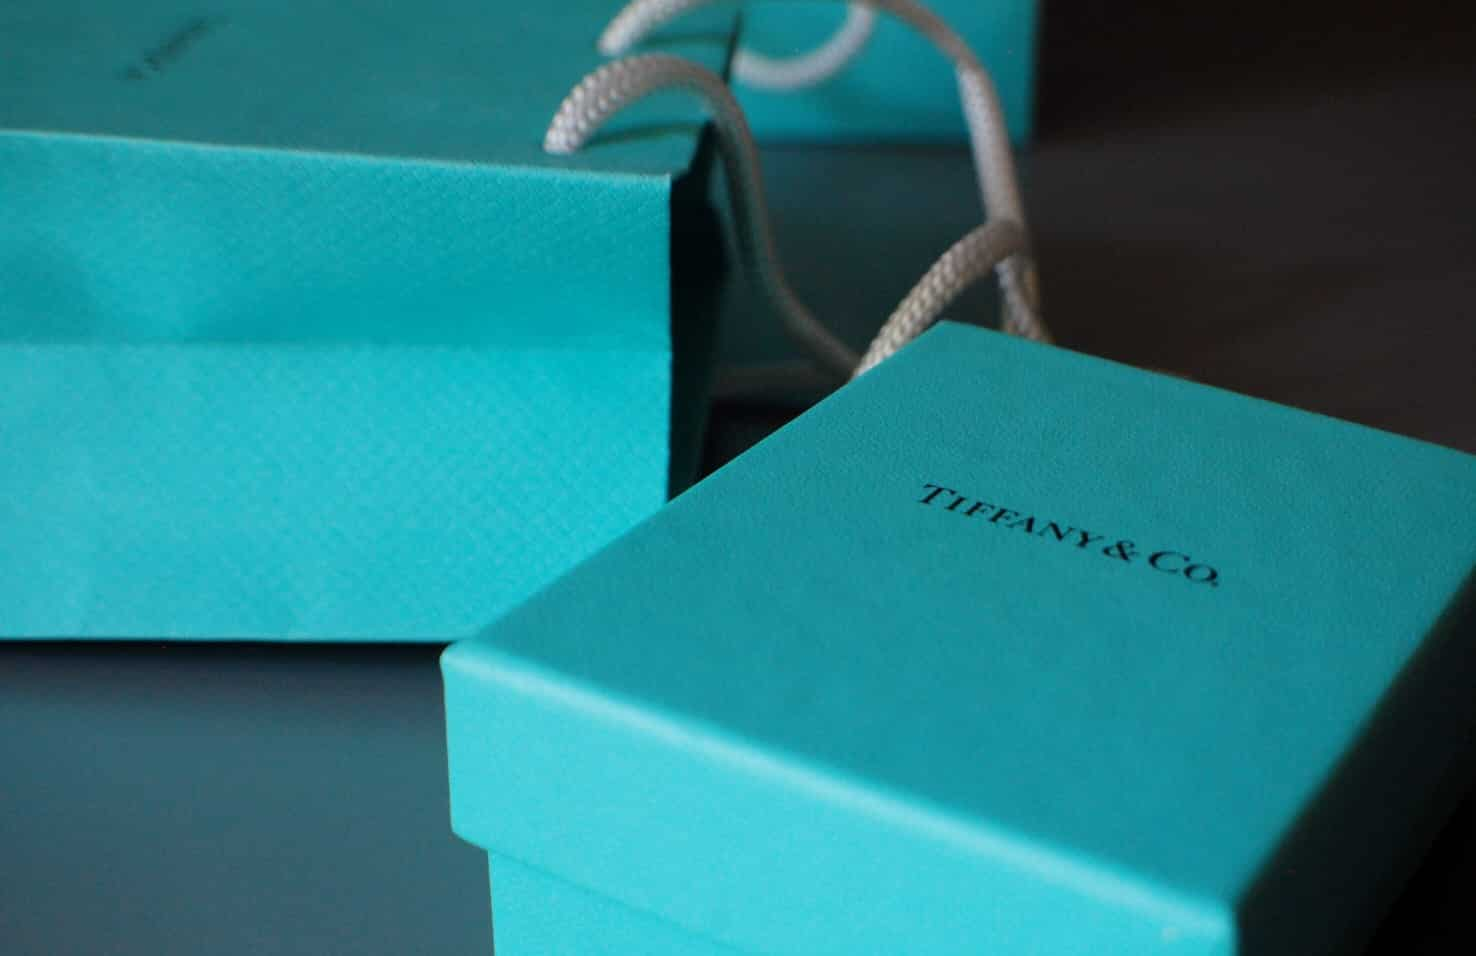 Tiffany hat, was Frauen lieben. Foto mrskiac via Twenty20